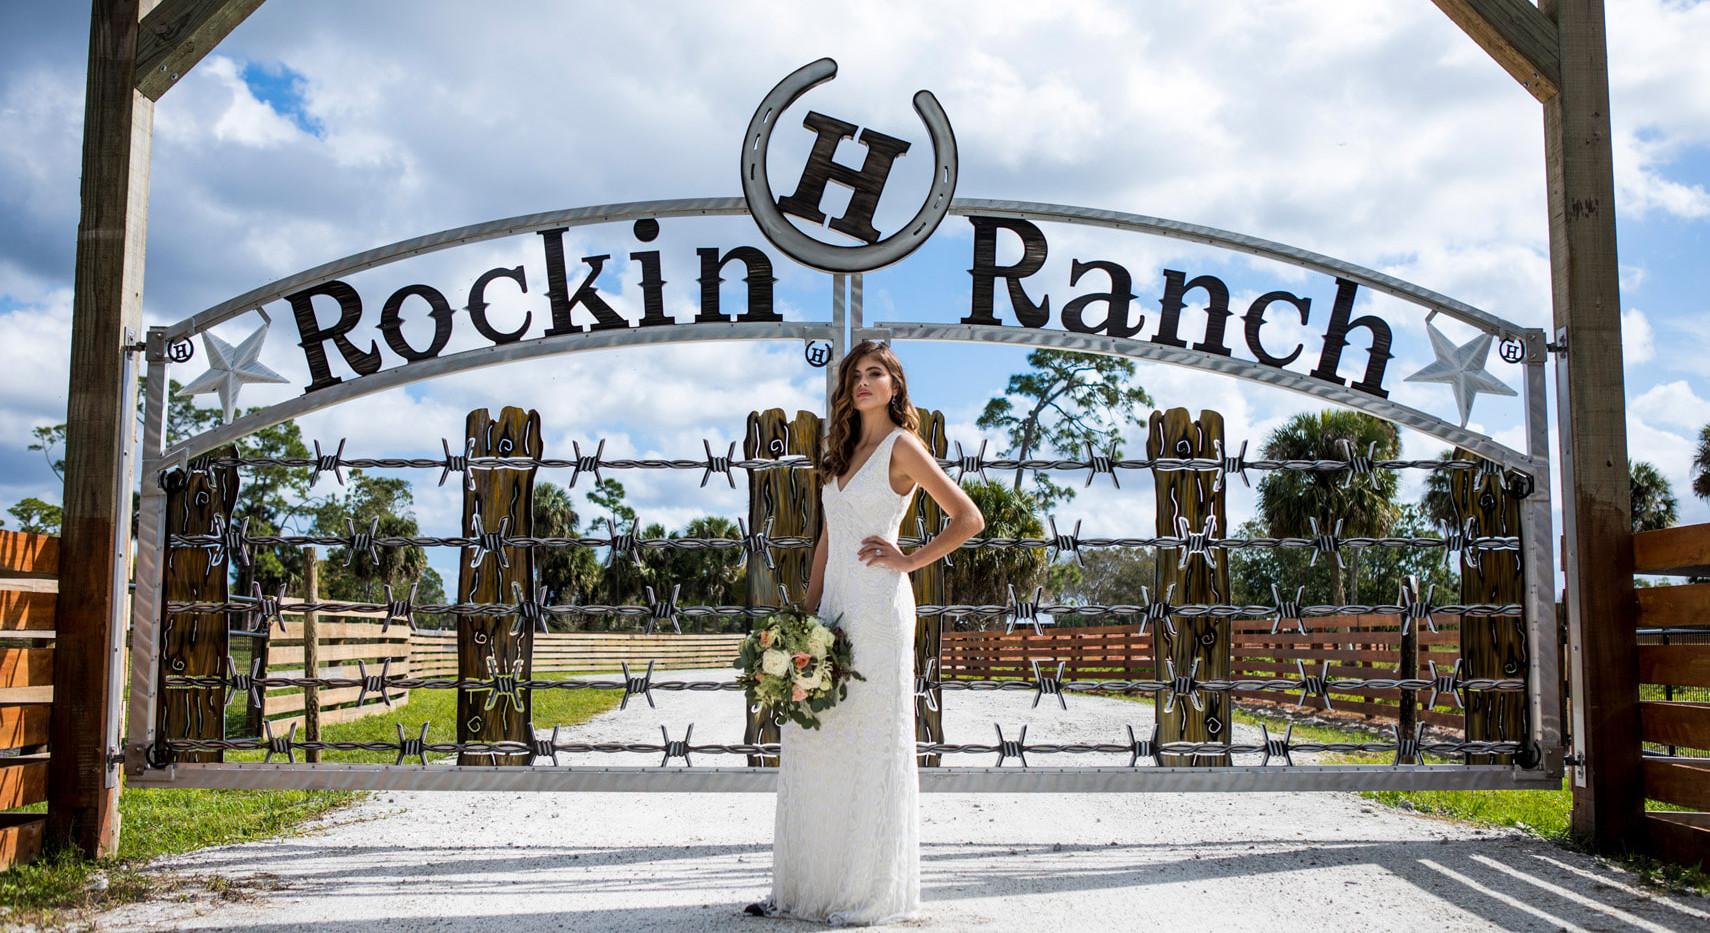 Rockin H Ranch Gate